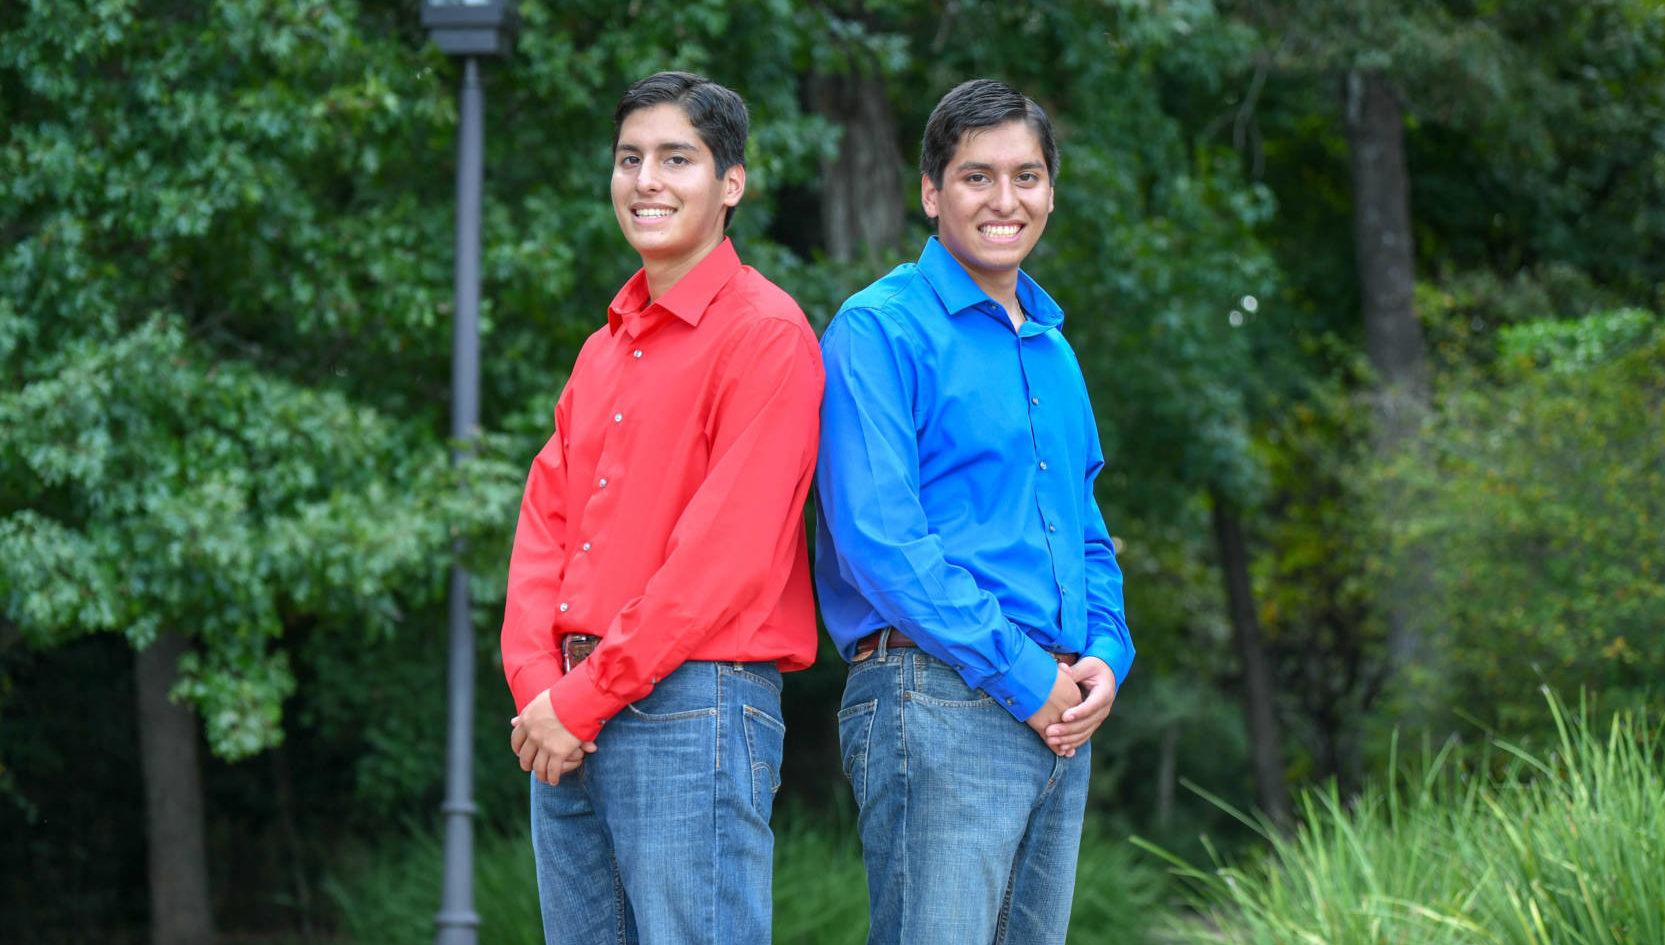 Identical Twins Graduate as Valedictorian and Salutatorian